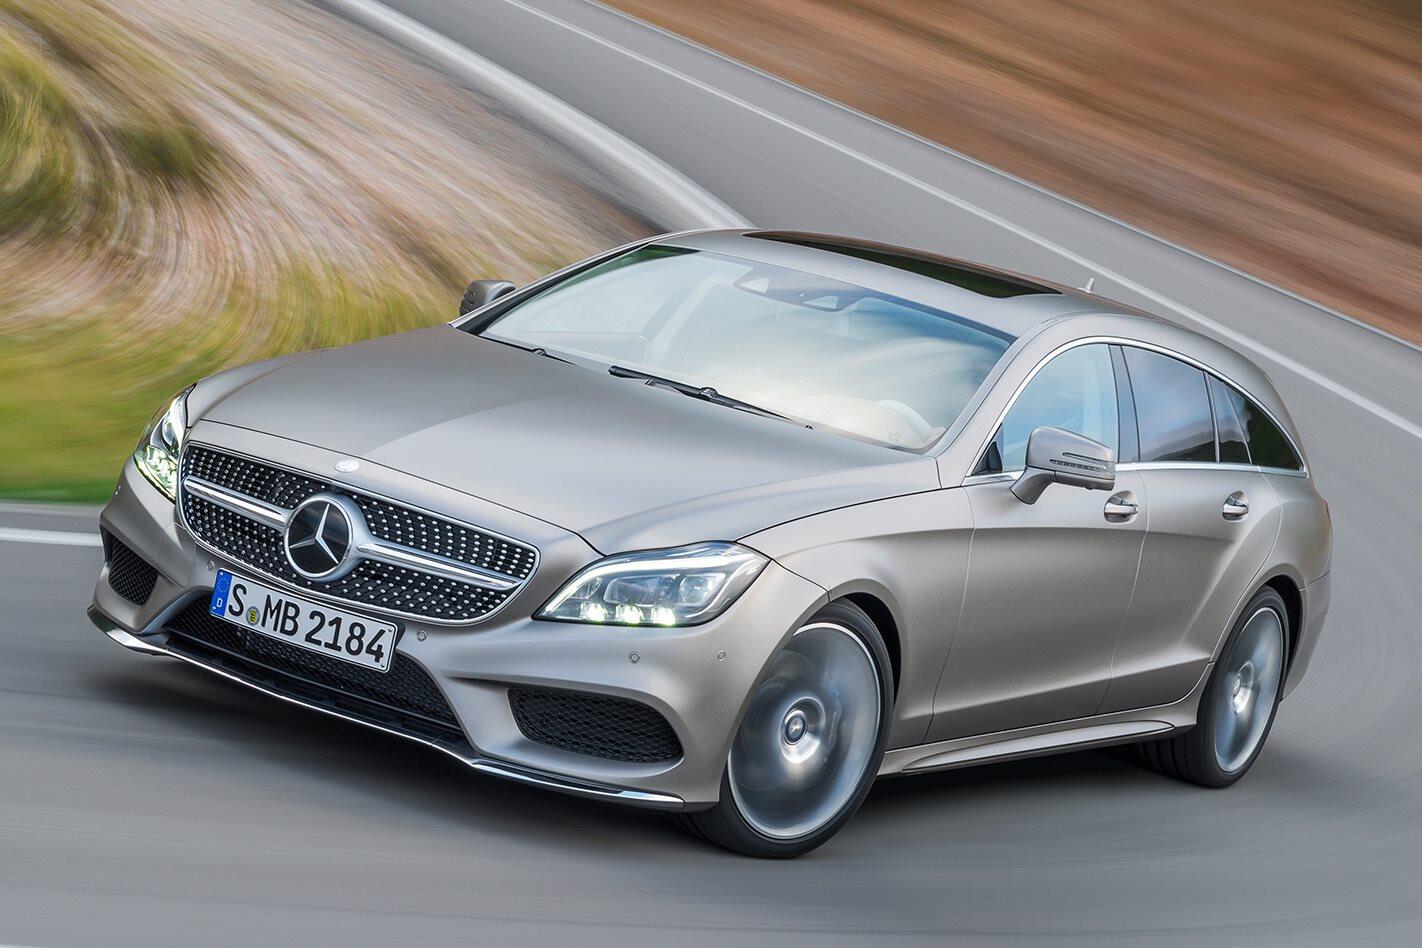 Mercedes-Benz CLS 500 review